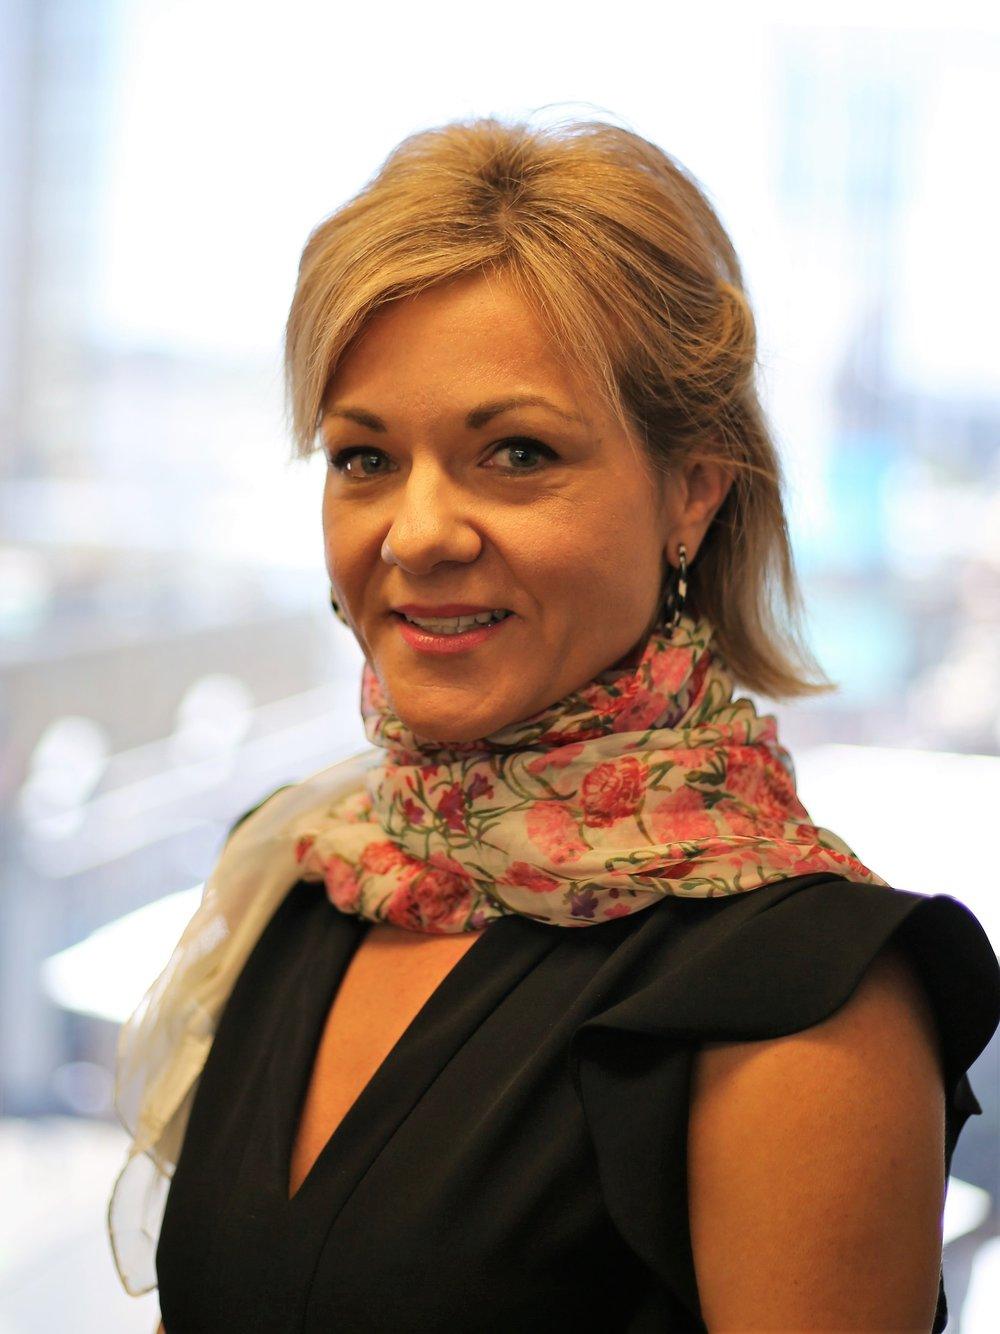 Sarah-Jane Sharp, Project Manager Path of Hope   >>>BIO